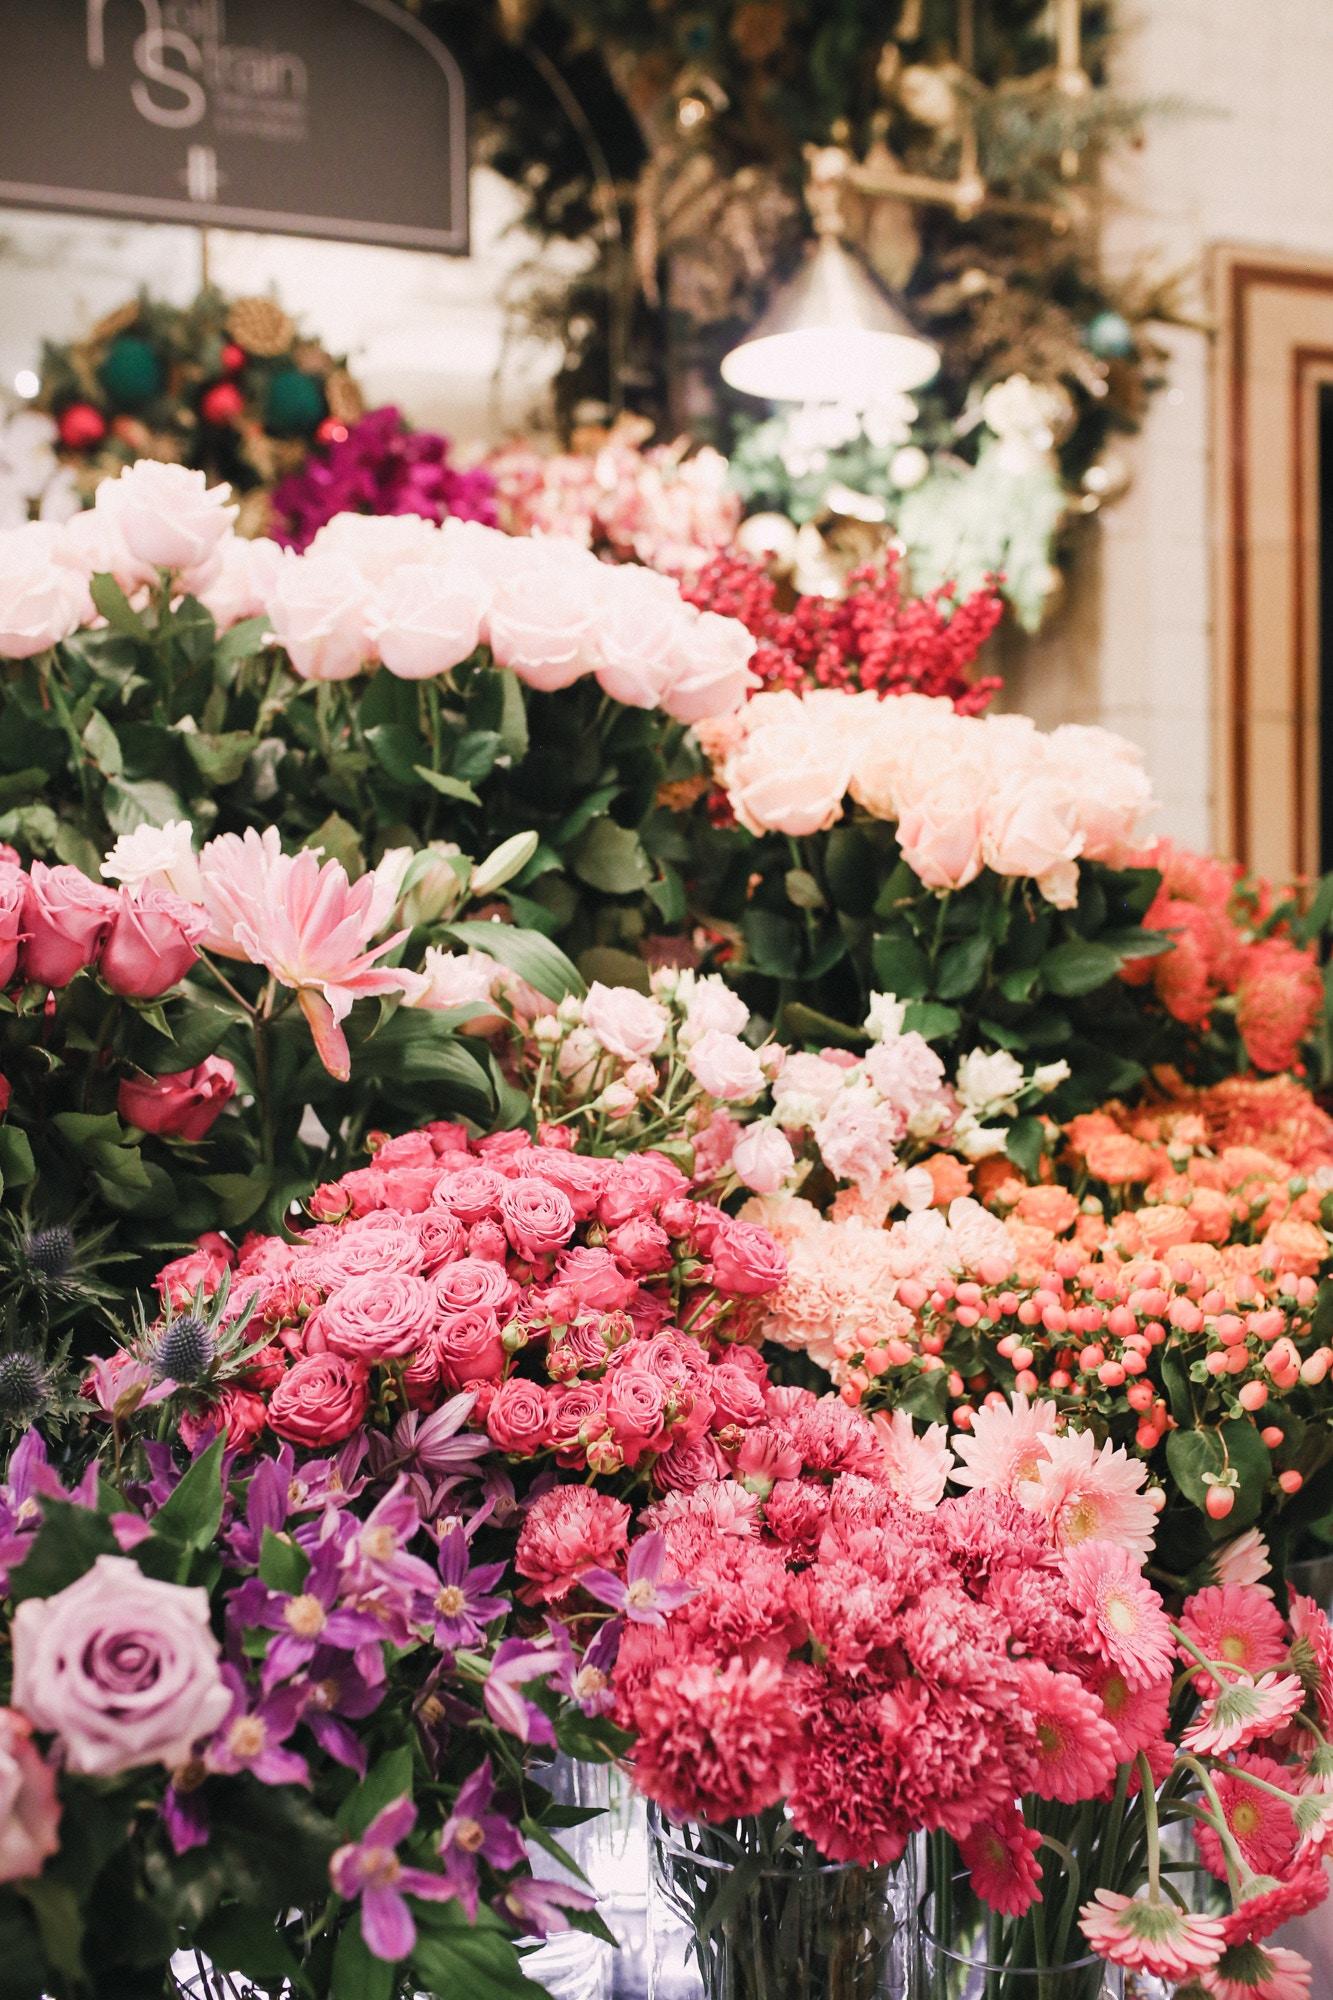 Florist at Harrod's in London